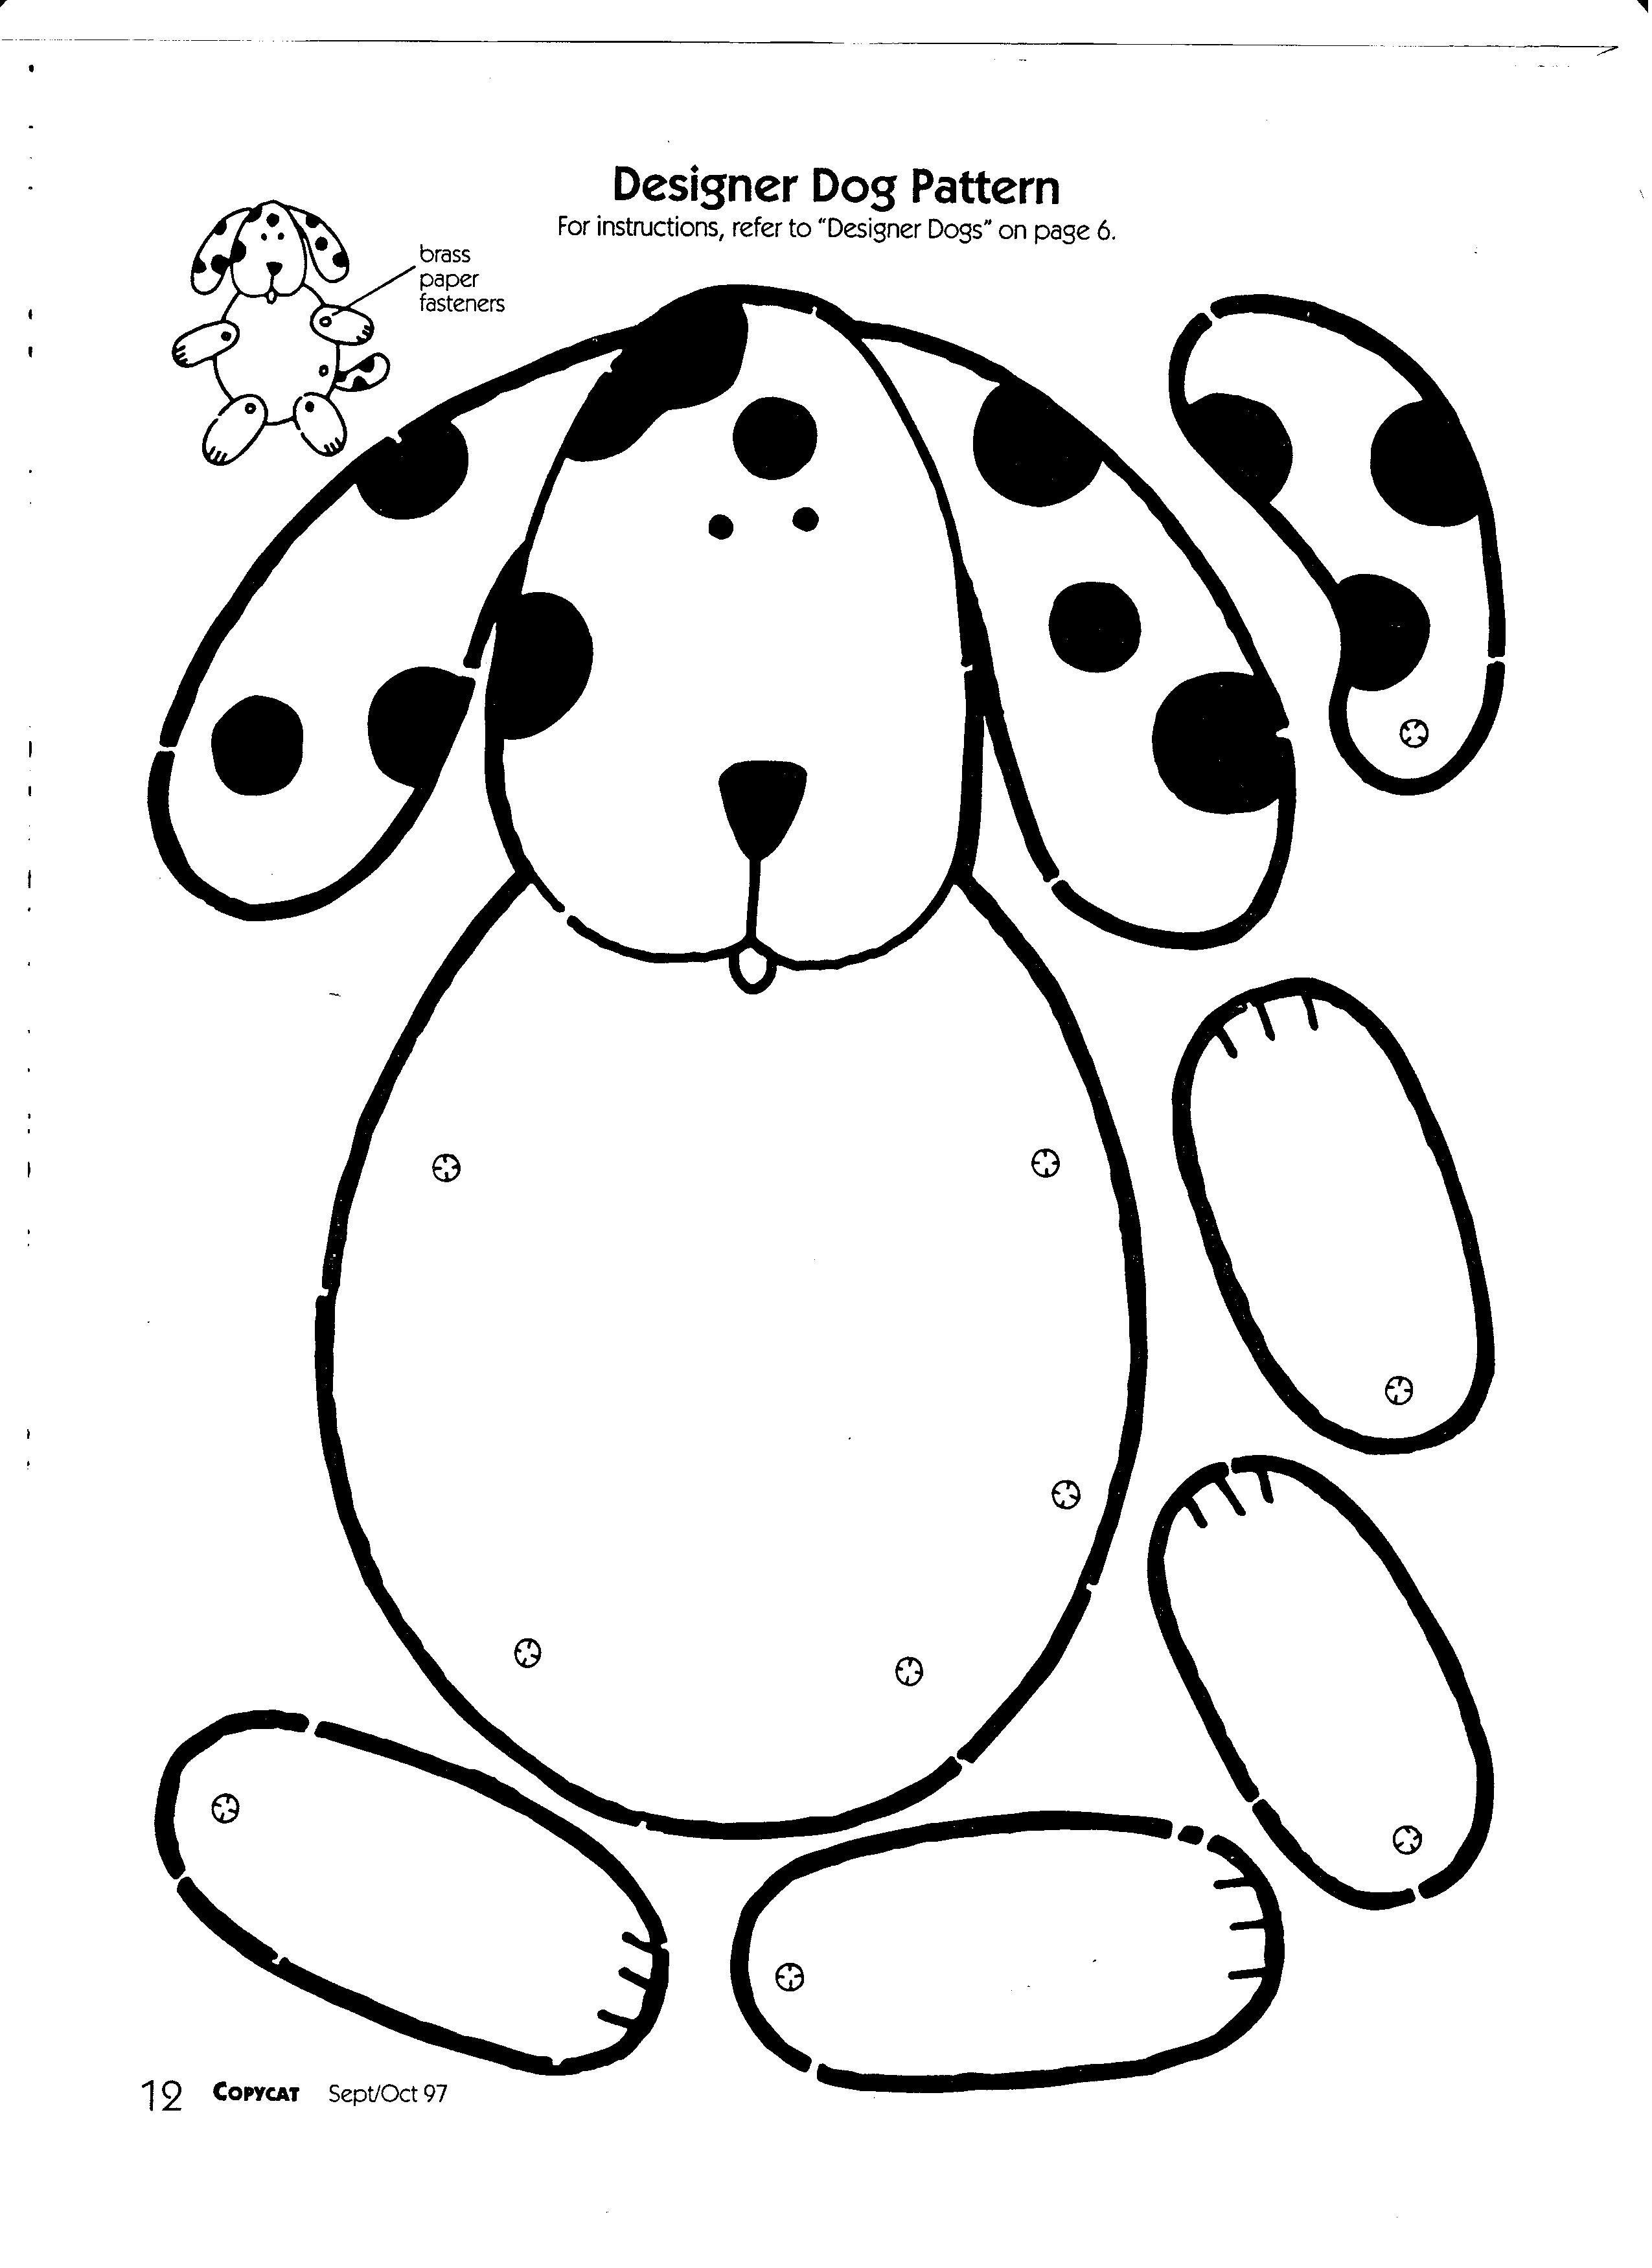 Pet Dog Design Worksheet Hunde Therapie Ideen [ 3501 x 2550 Pixel ]